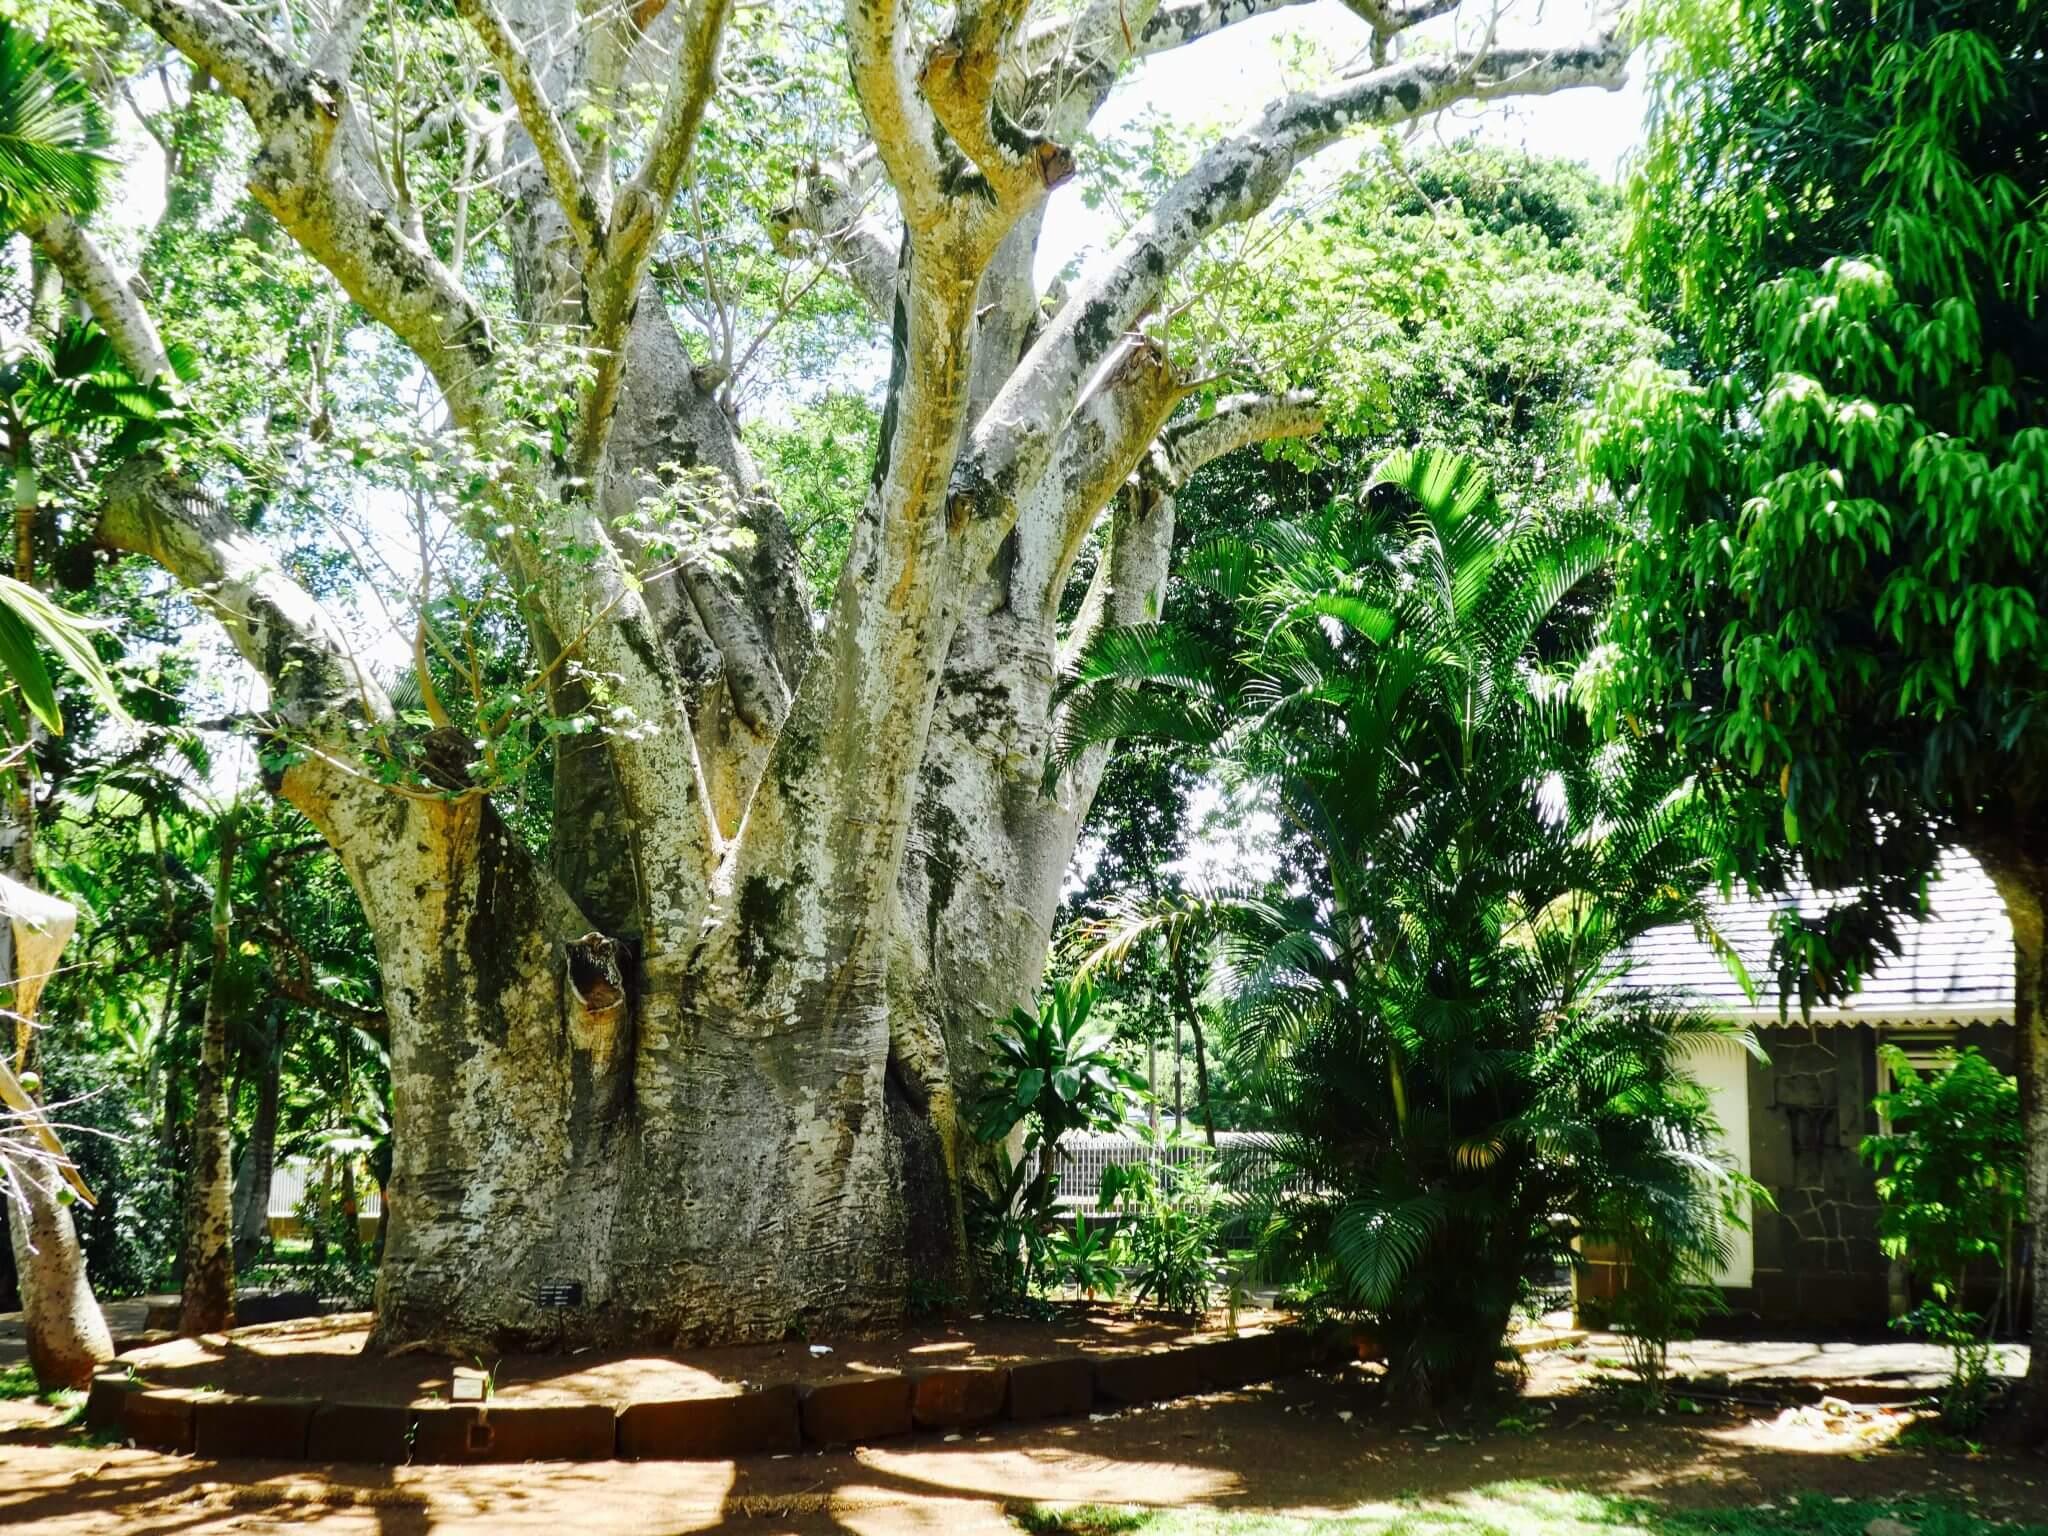 Visiter le jardin de pamplemousses l 39 ile maurice avis for Jardin a visiter